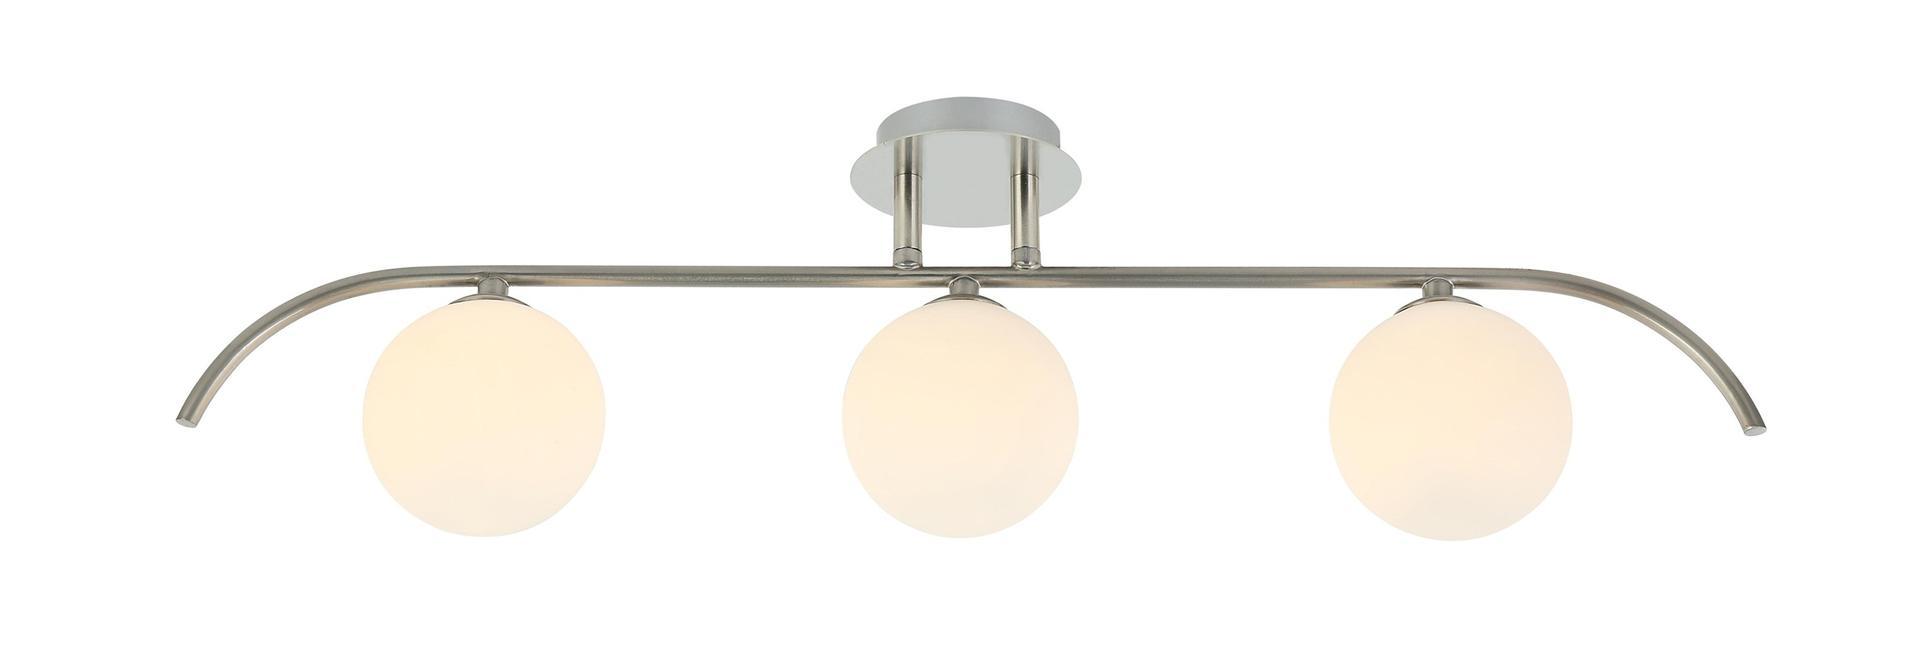 40W CEILING LAMP 64341-3